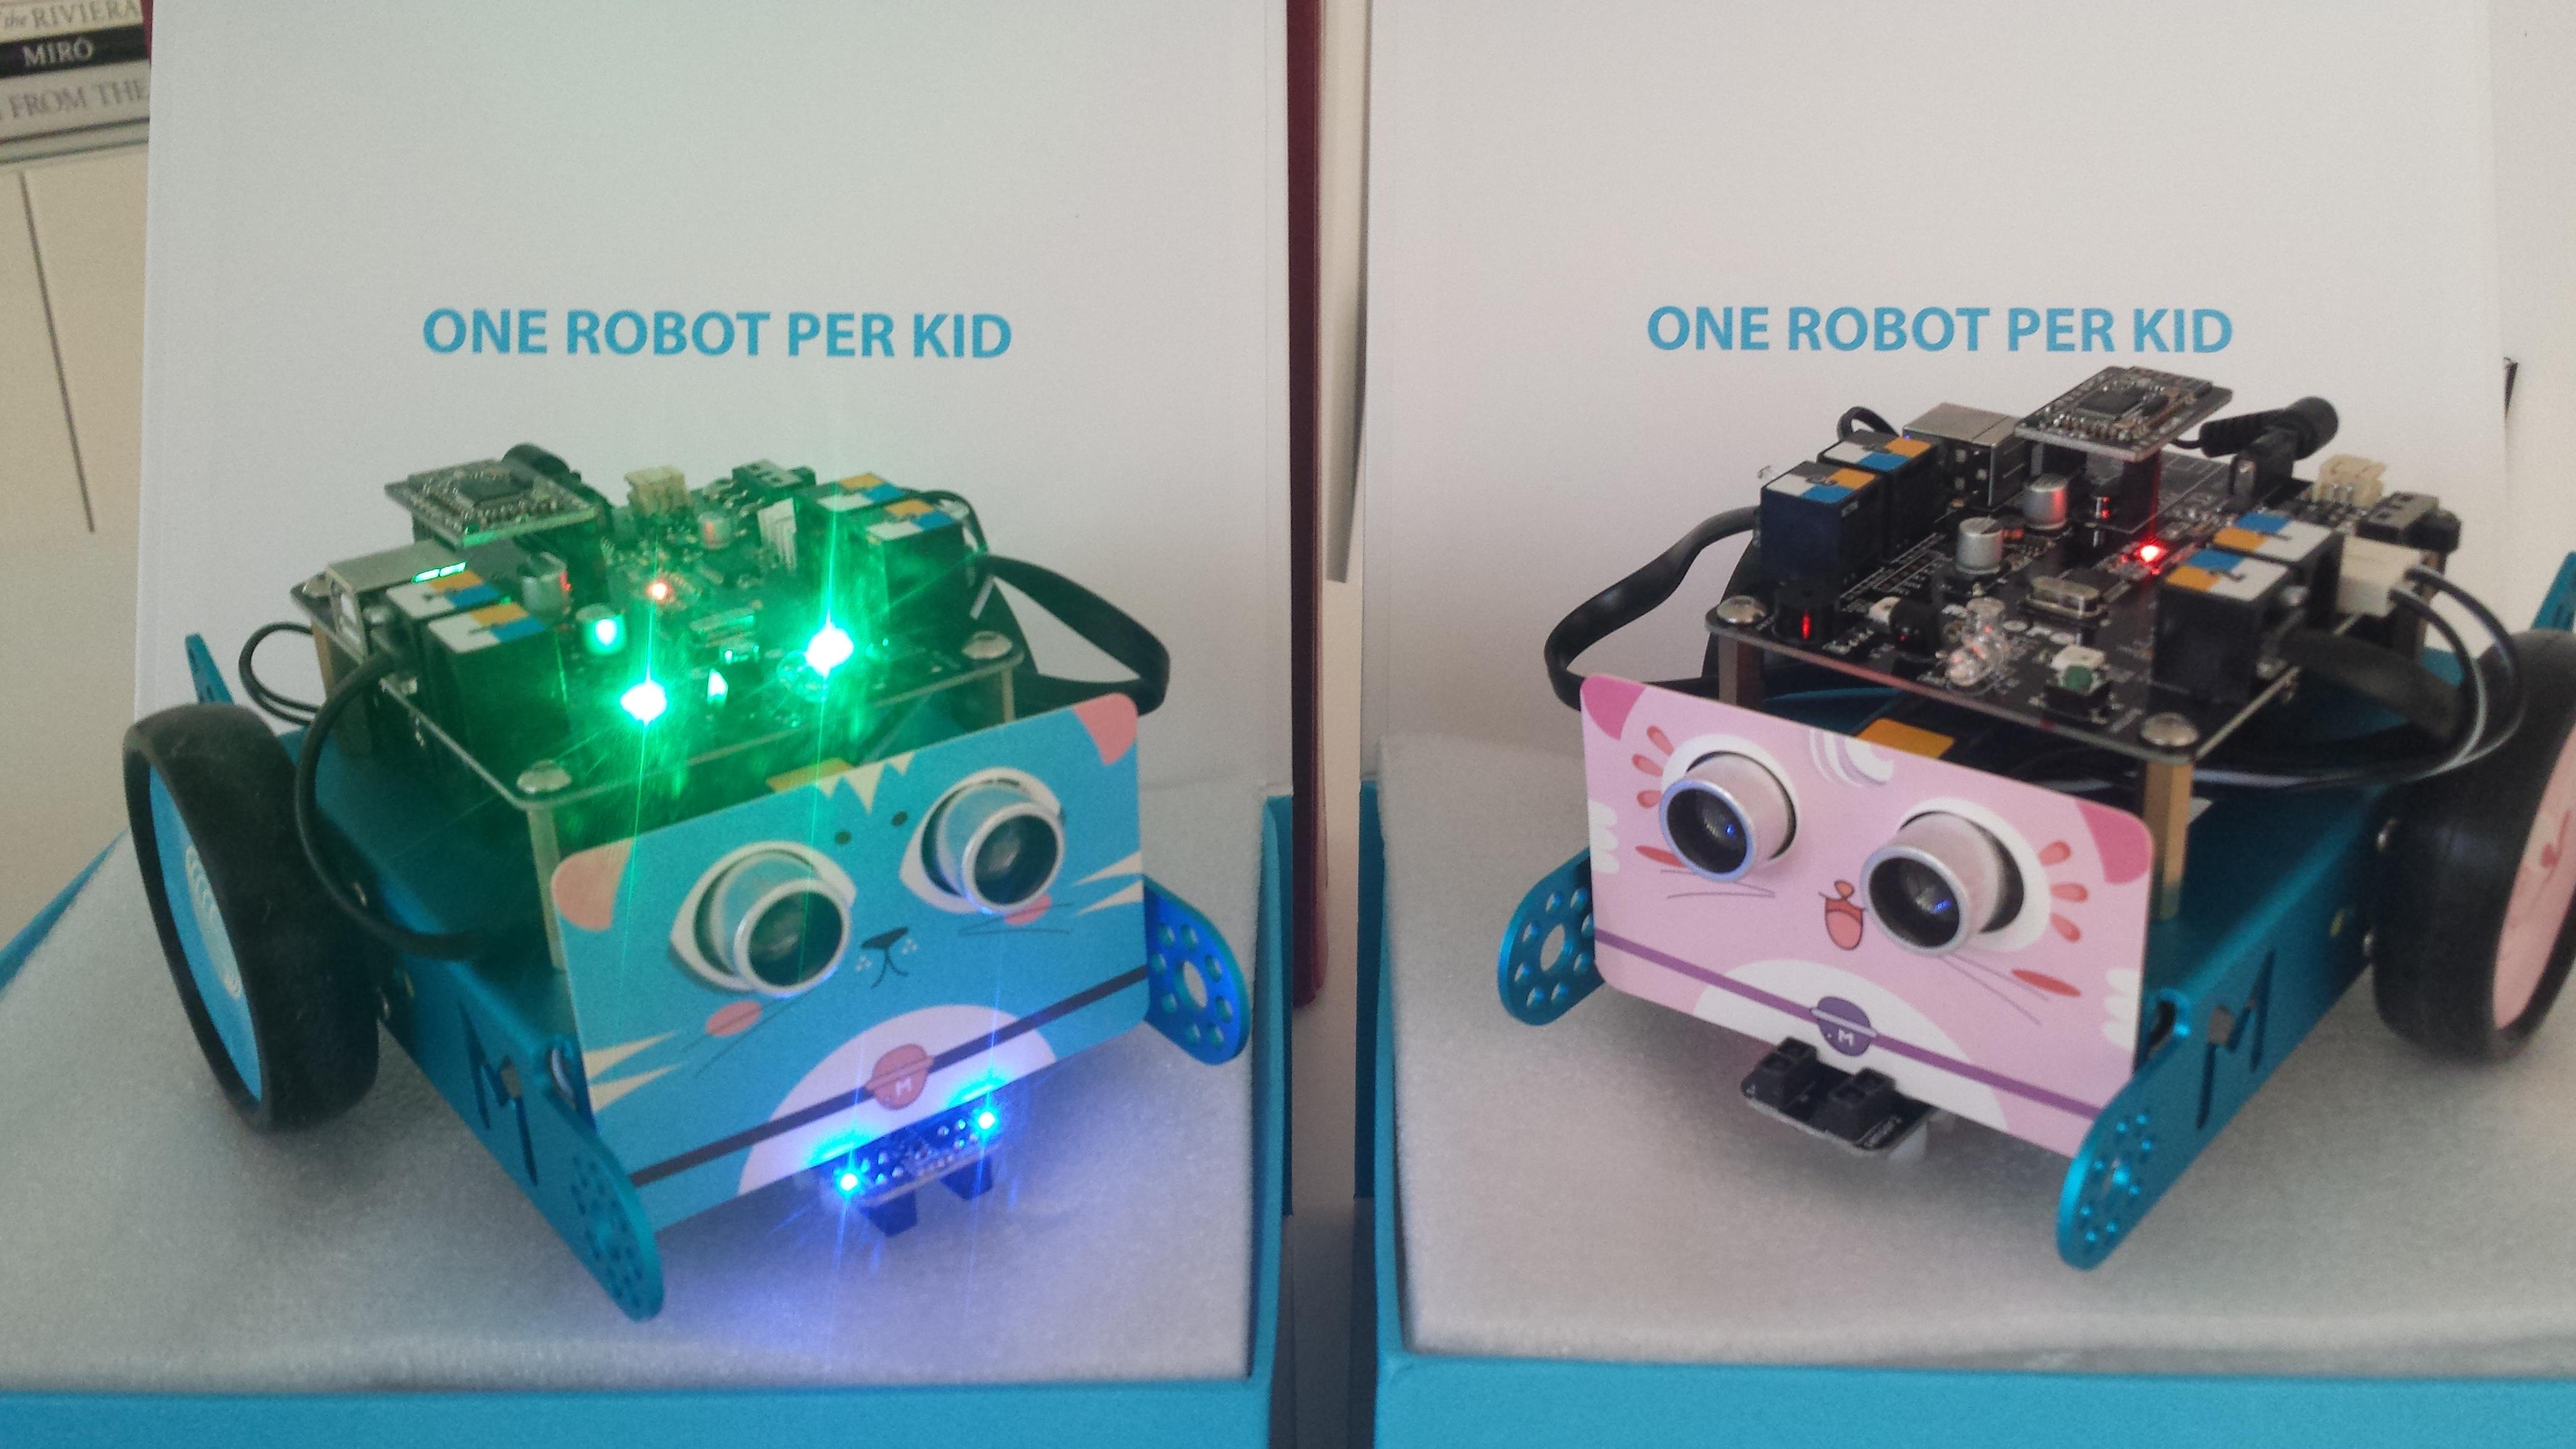 Robotics Arduino And Coding For Kids How To Explain Basic Electronics 20151002 170549